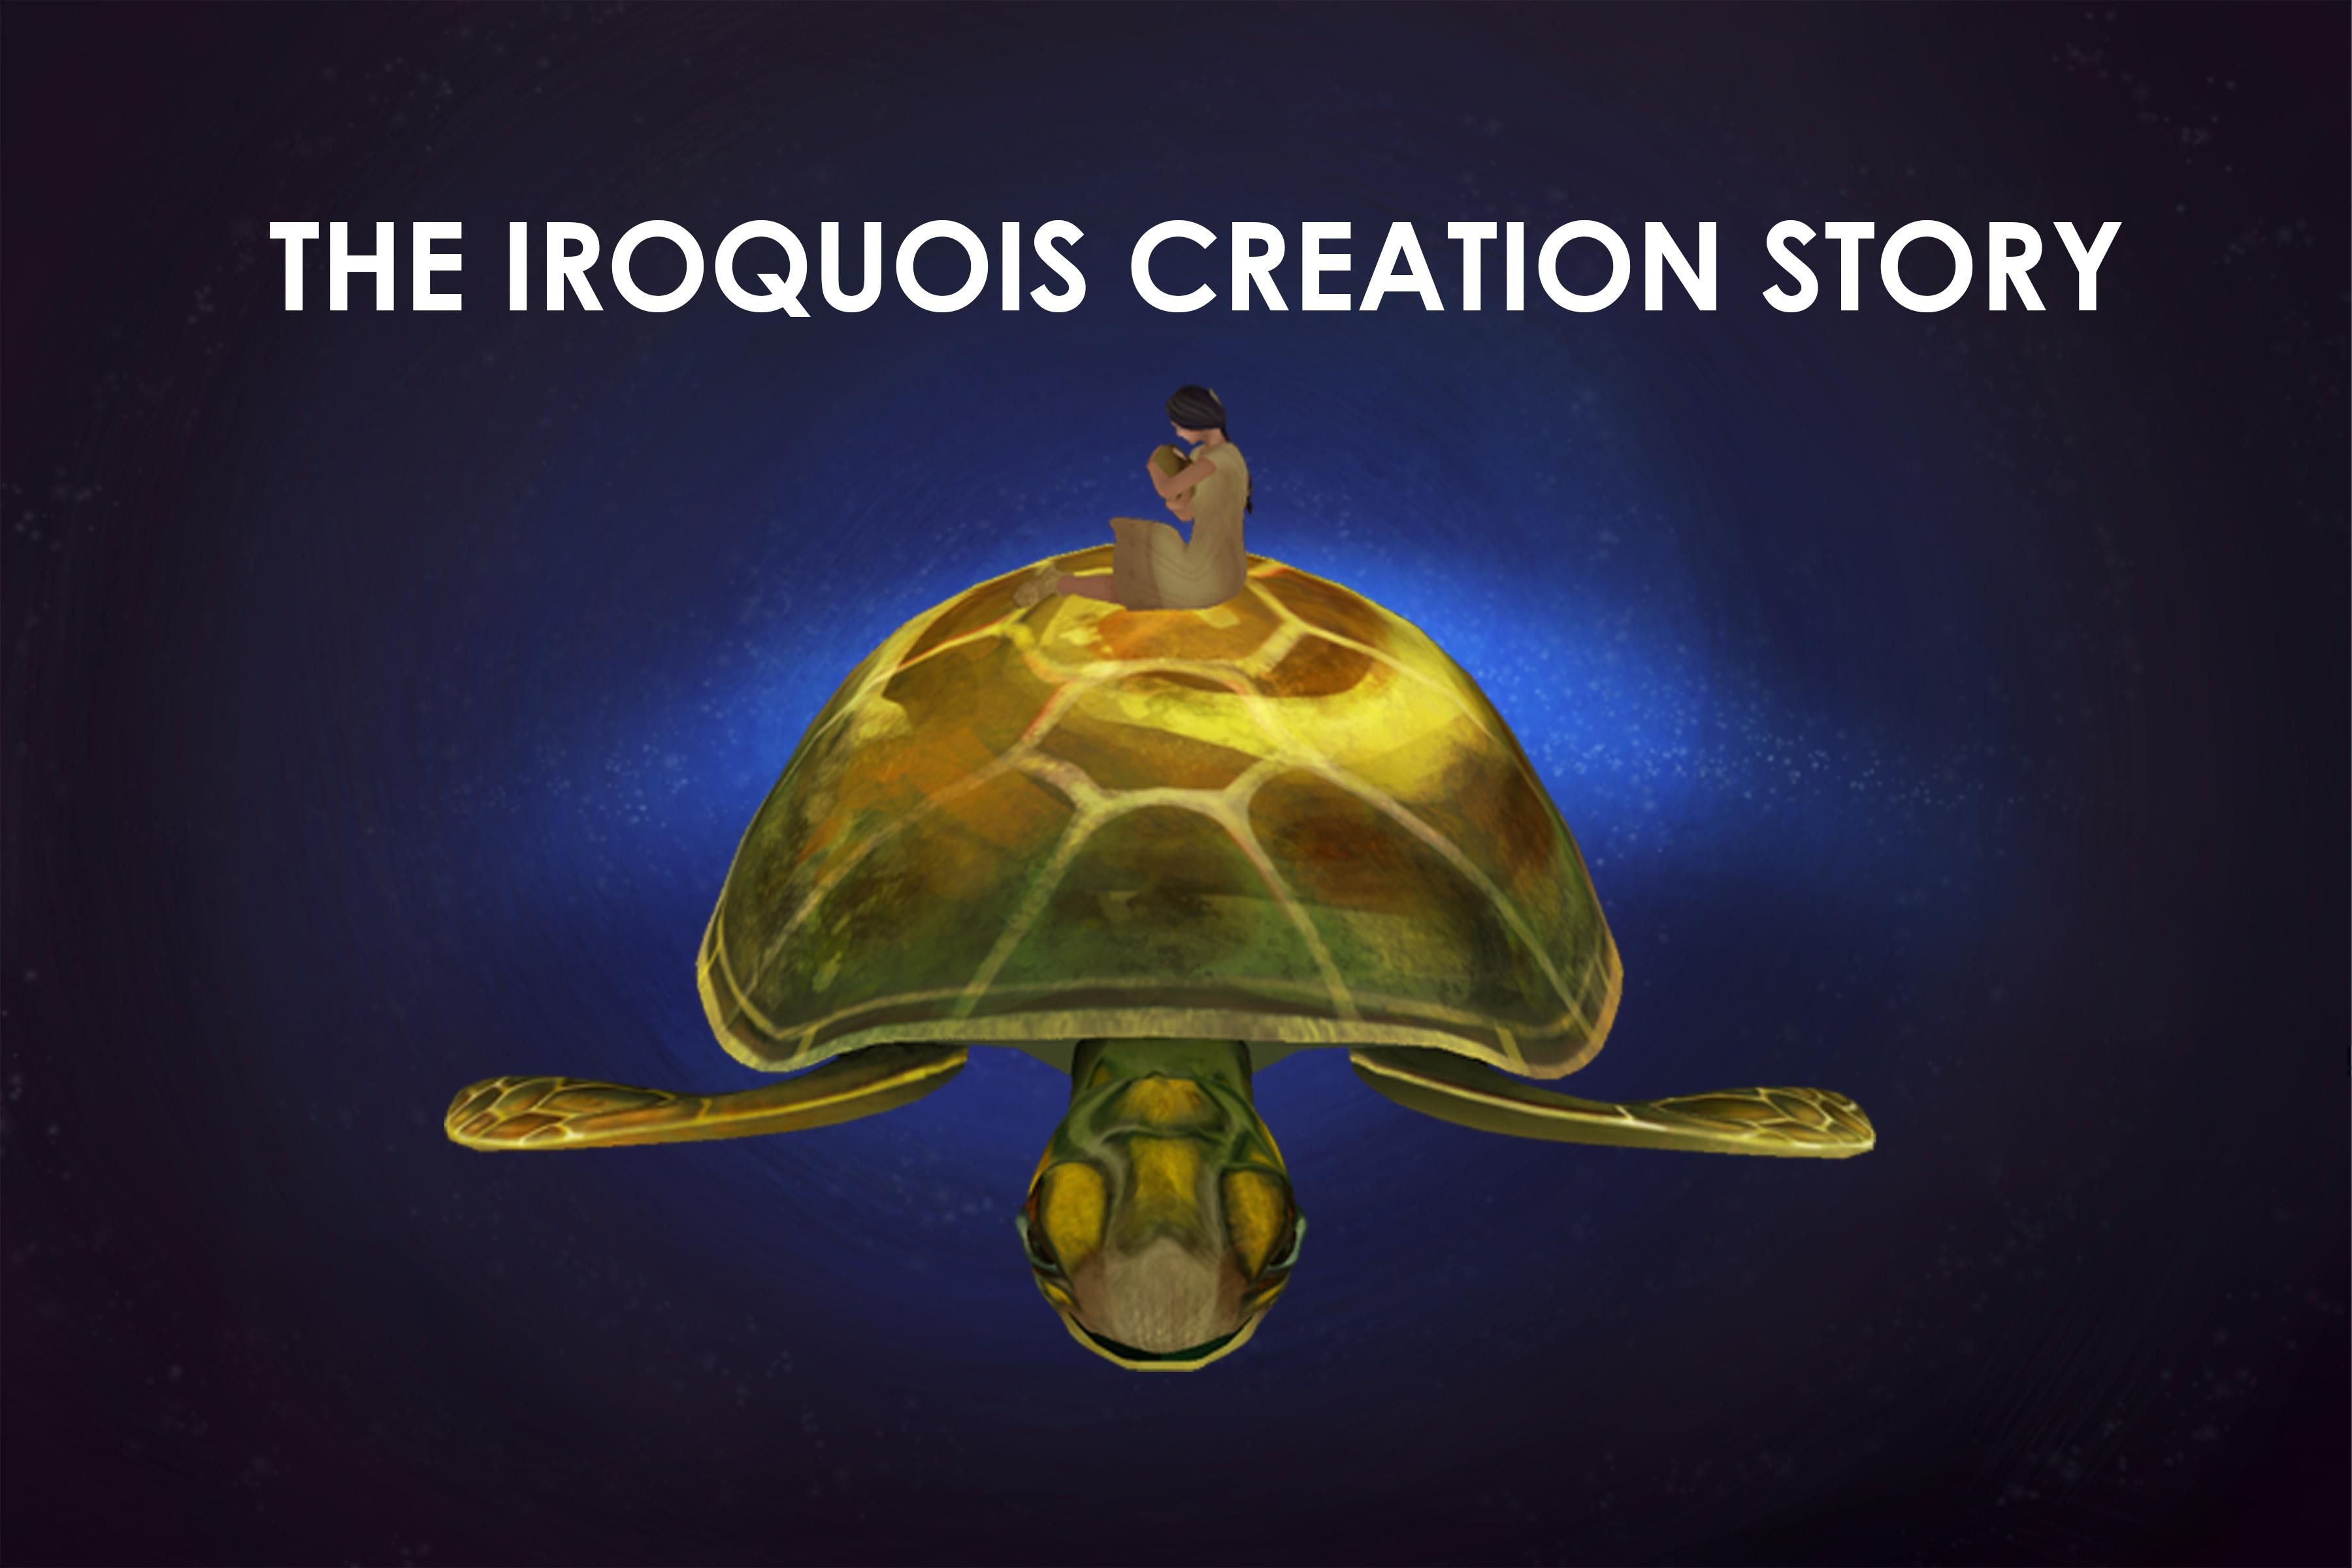 Warning turtles amp tortoises inc - The Iroquois Creation Story